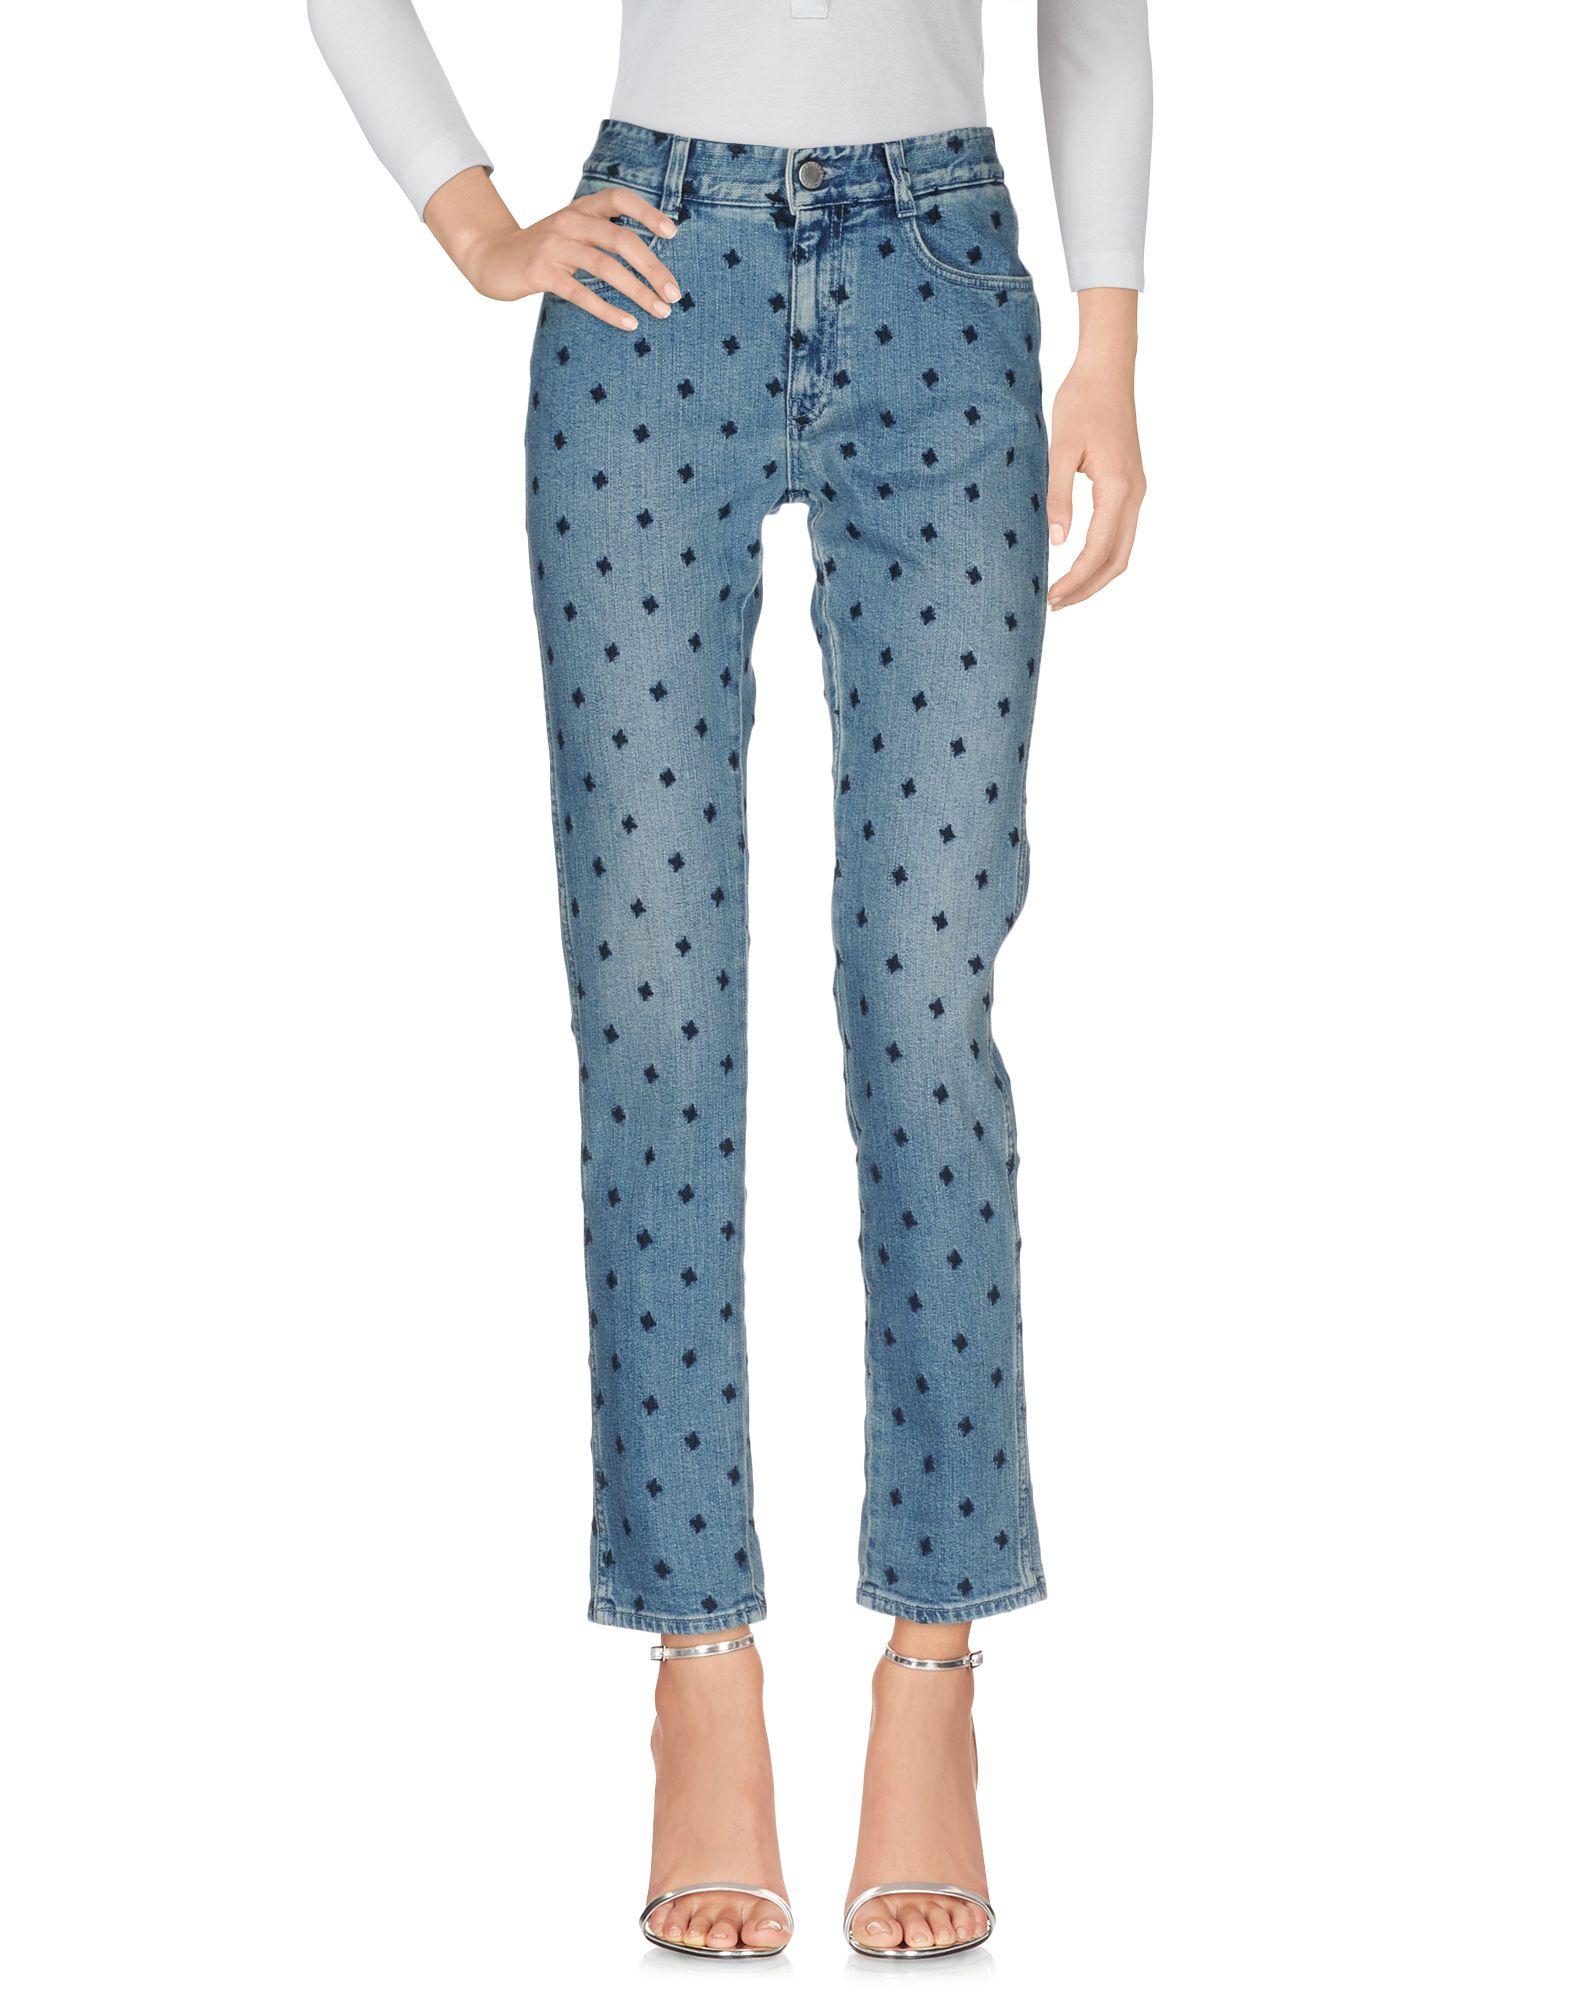 Pantaloni Jeans Stella Mccartney donna - - - 42649618XC 807